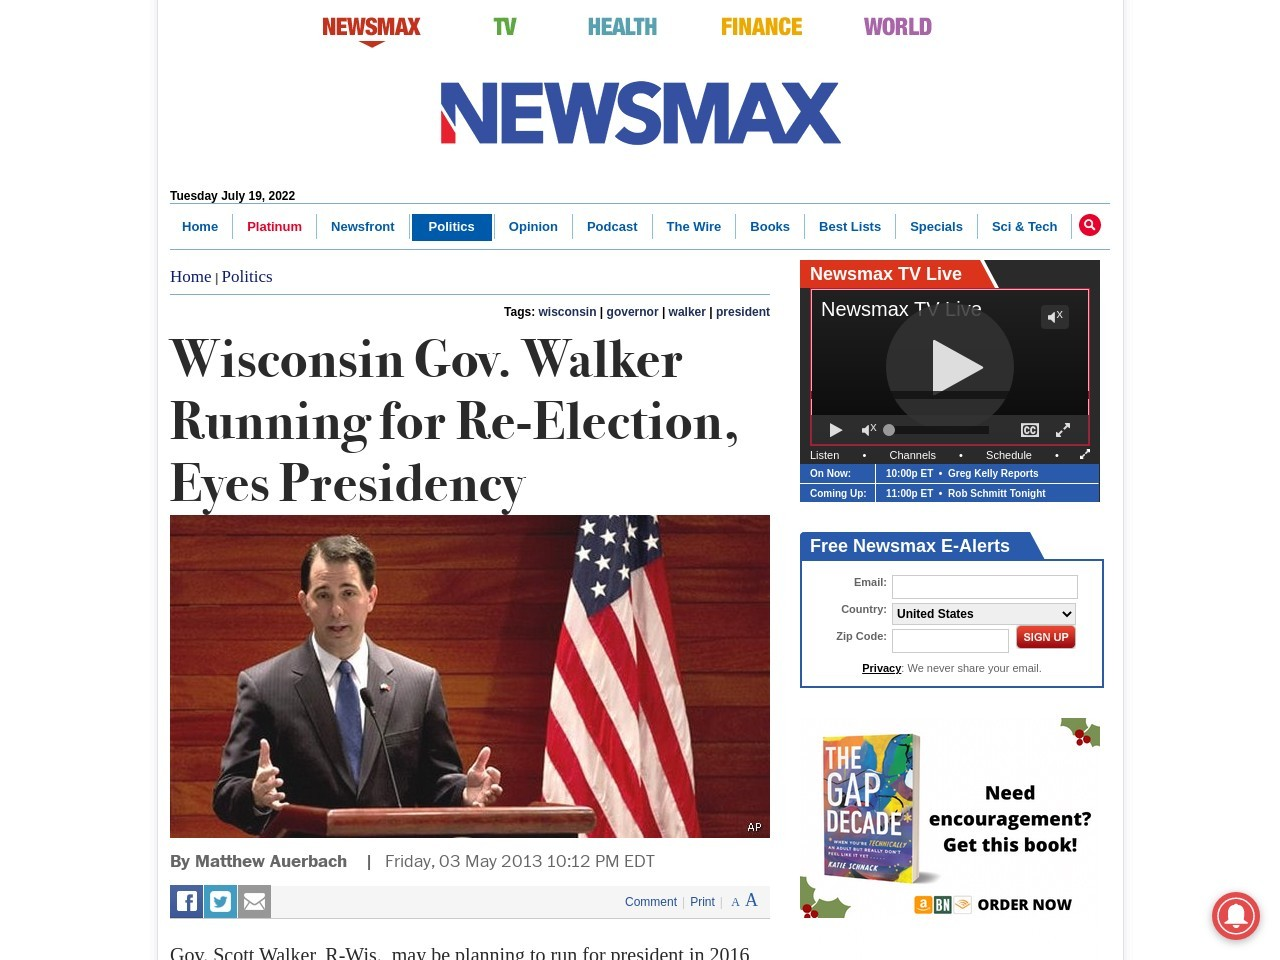 Wisconsin Gov. Walker Running for Re-Election, Eyes Presidency